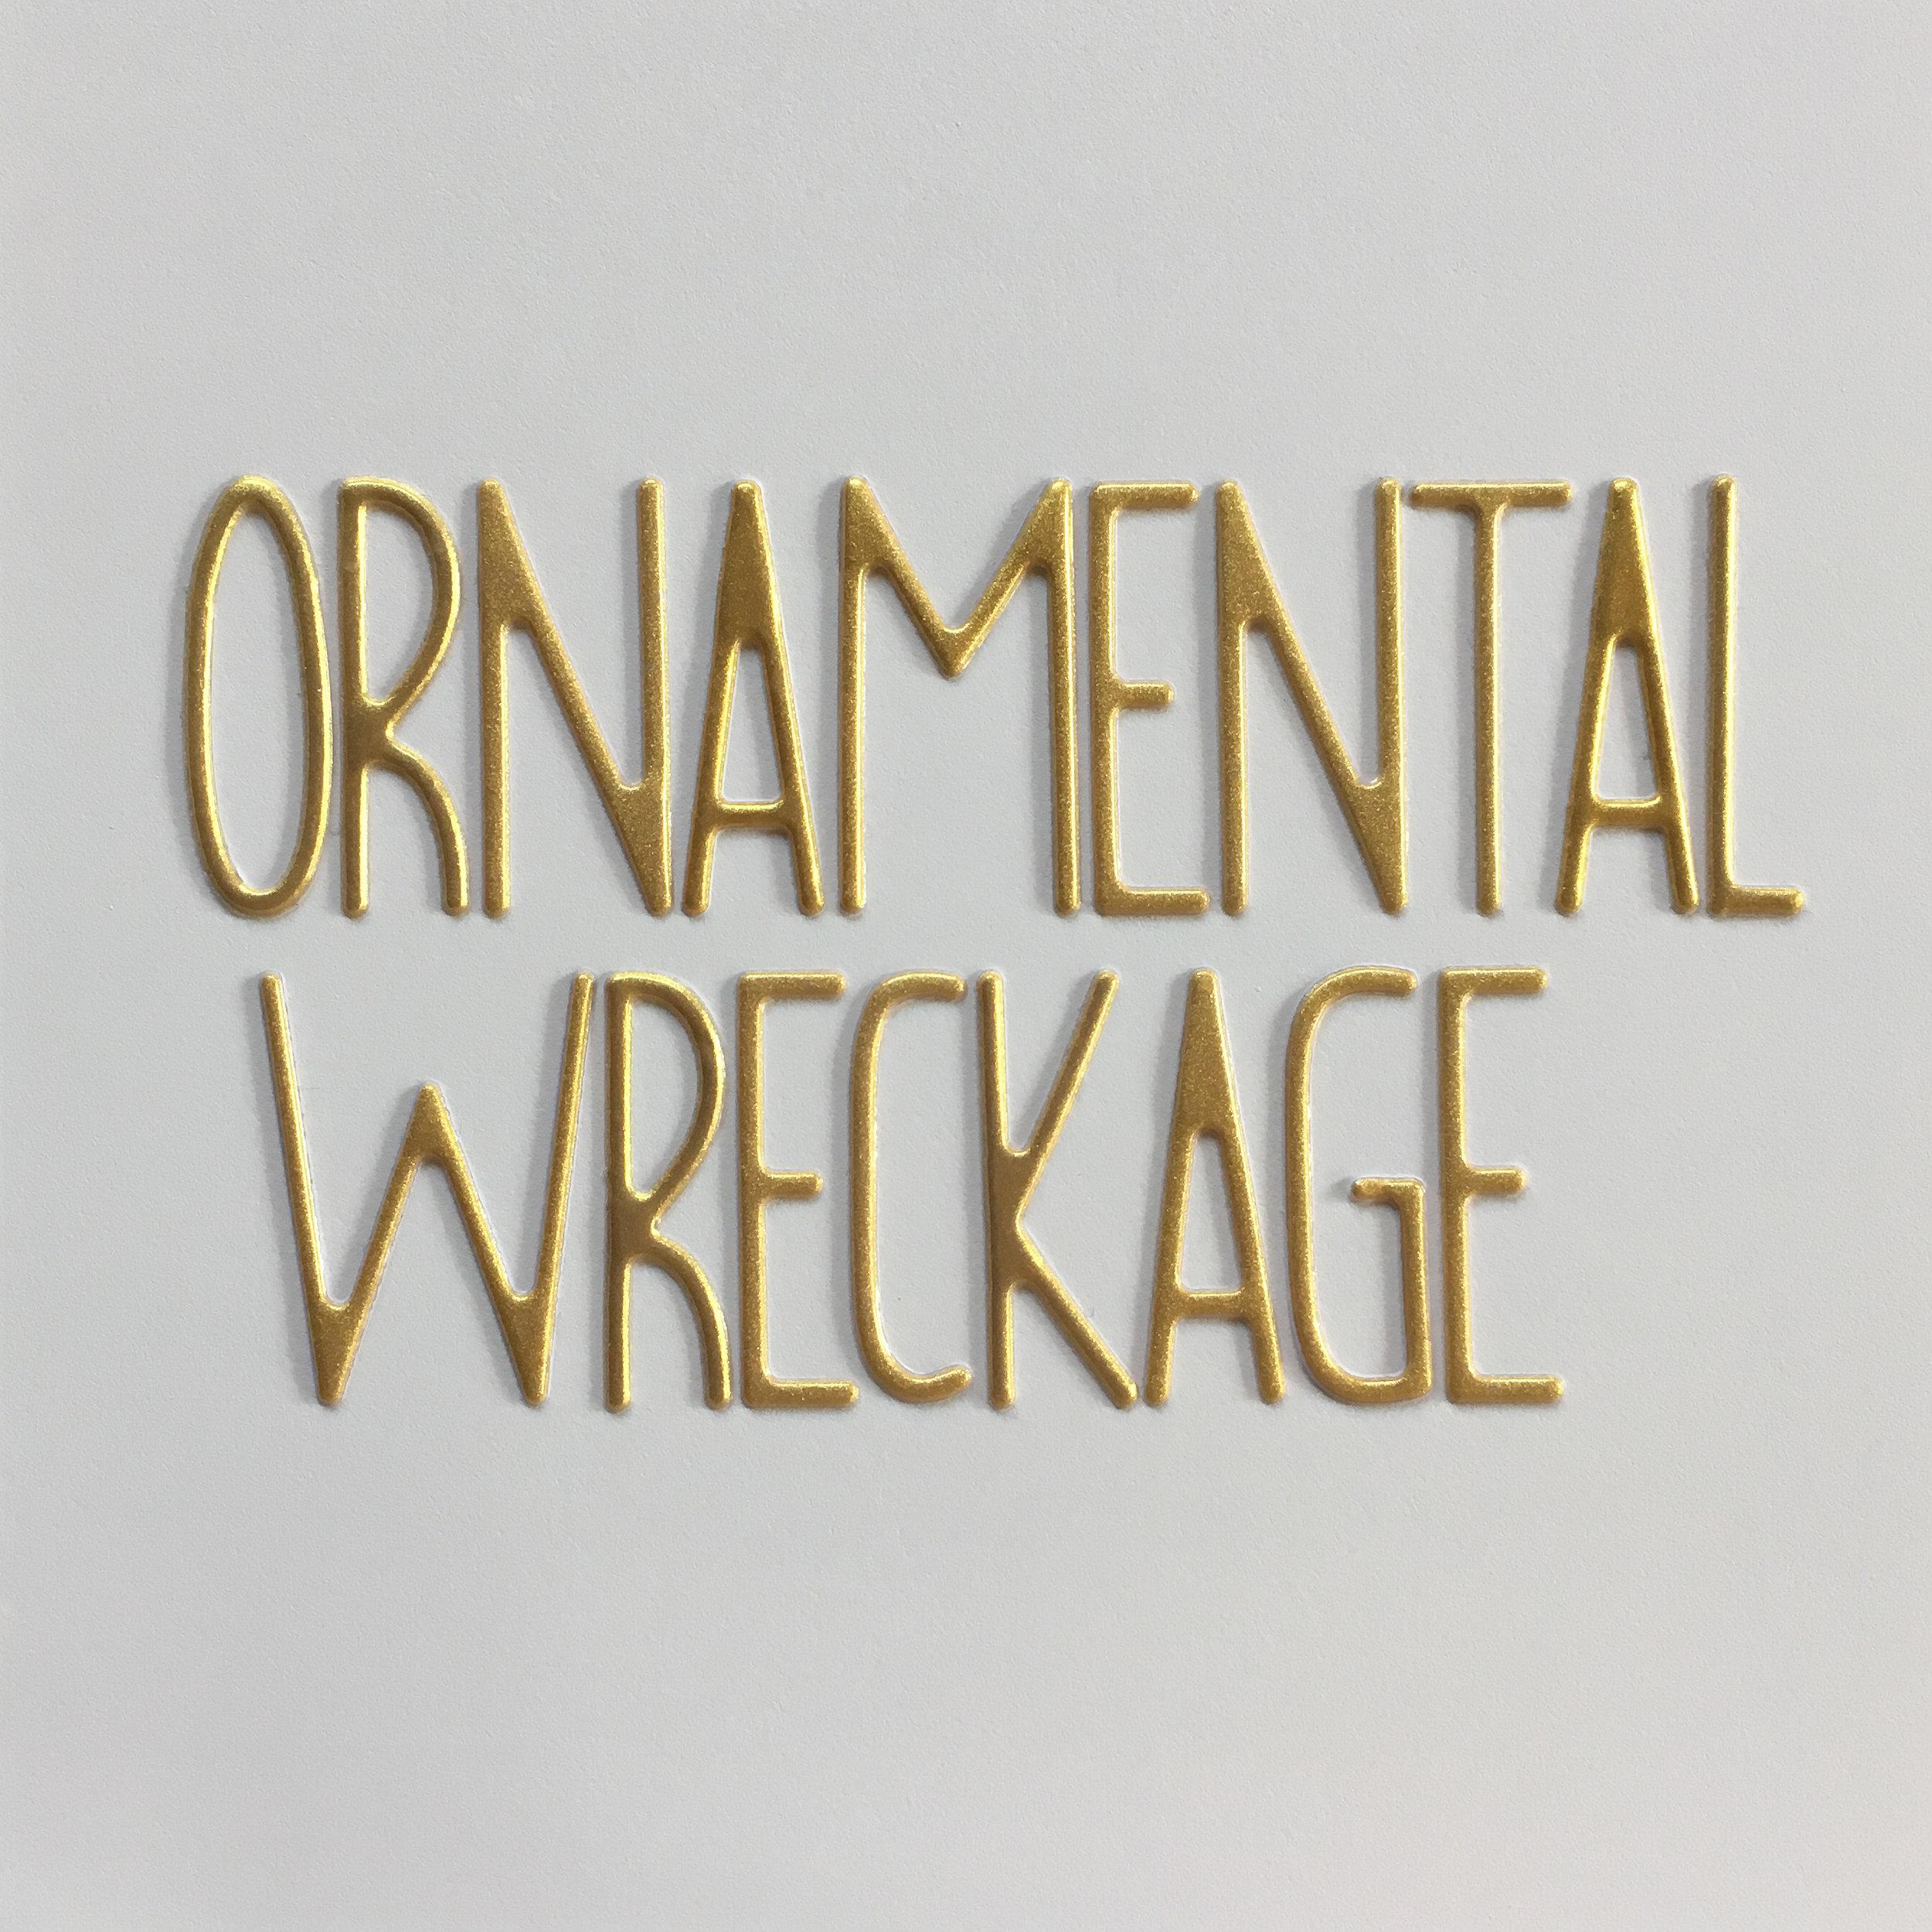 ornamental wreckage.jpg